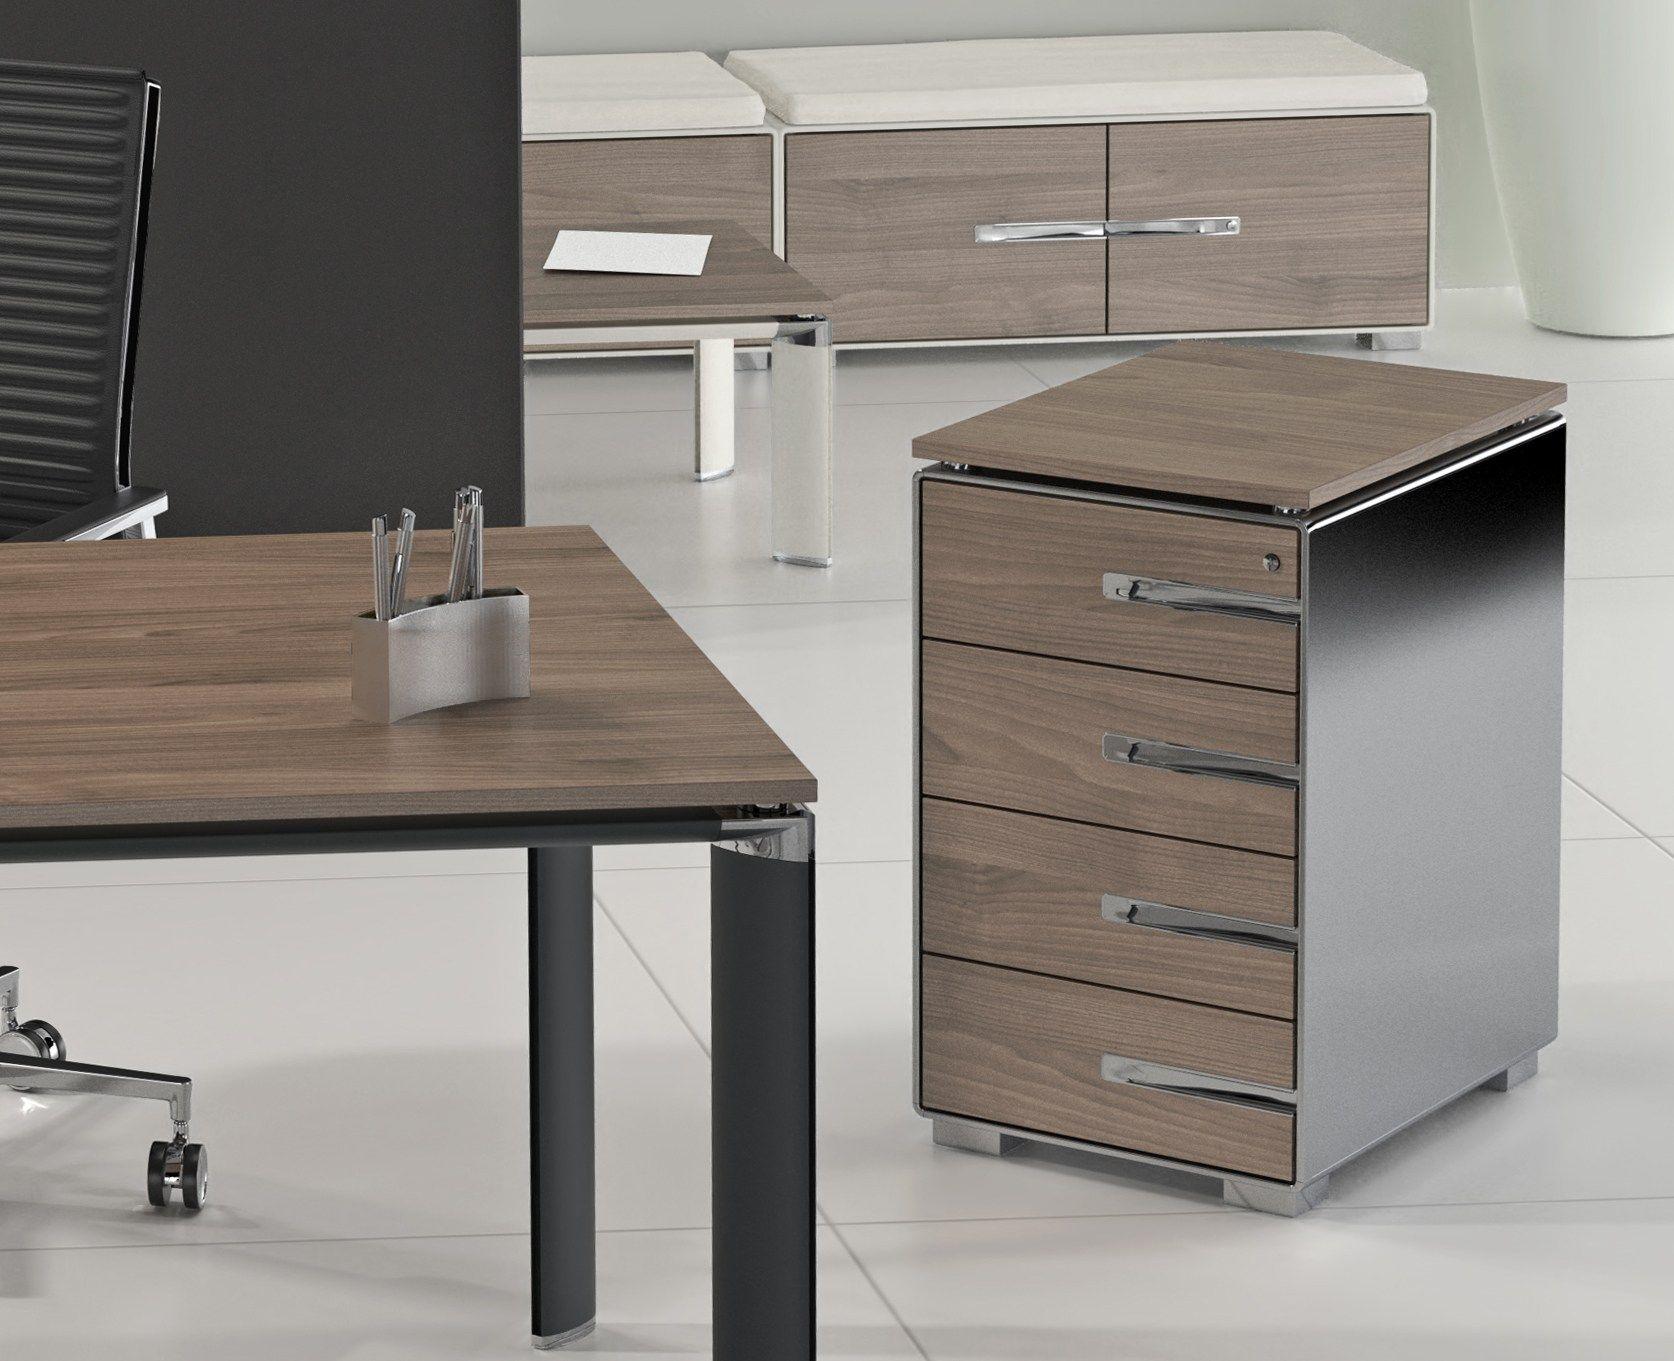 kbox office drawer unit by tecnitalia. Black Bedroom Furniture Sets. Home Design Ideas